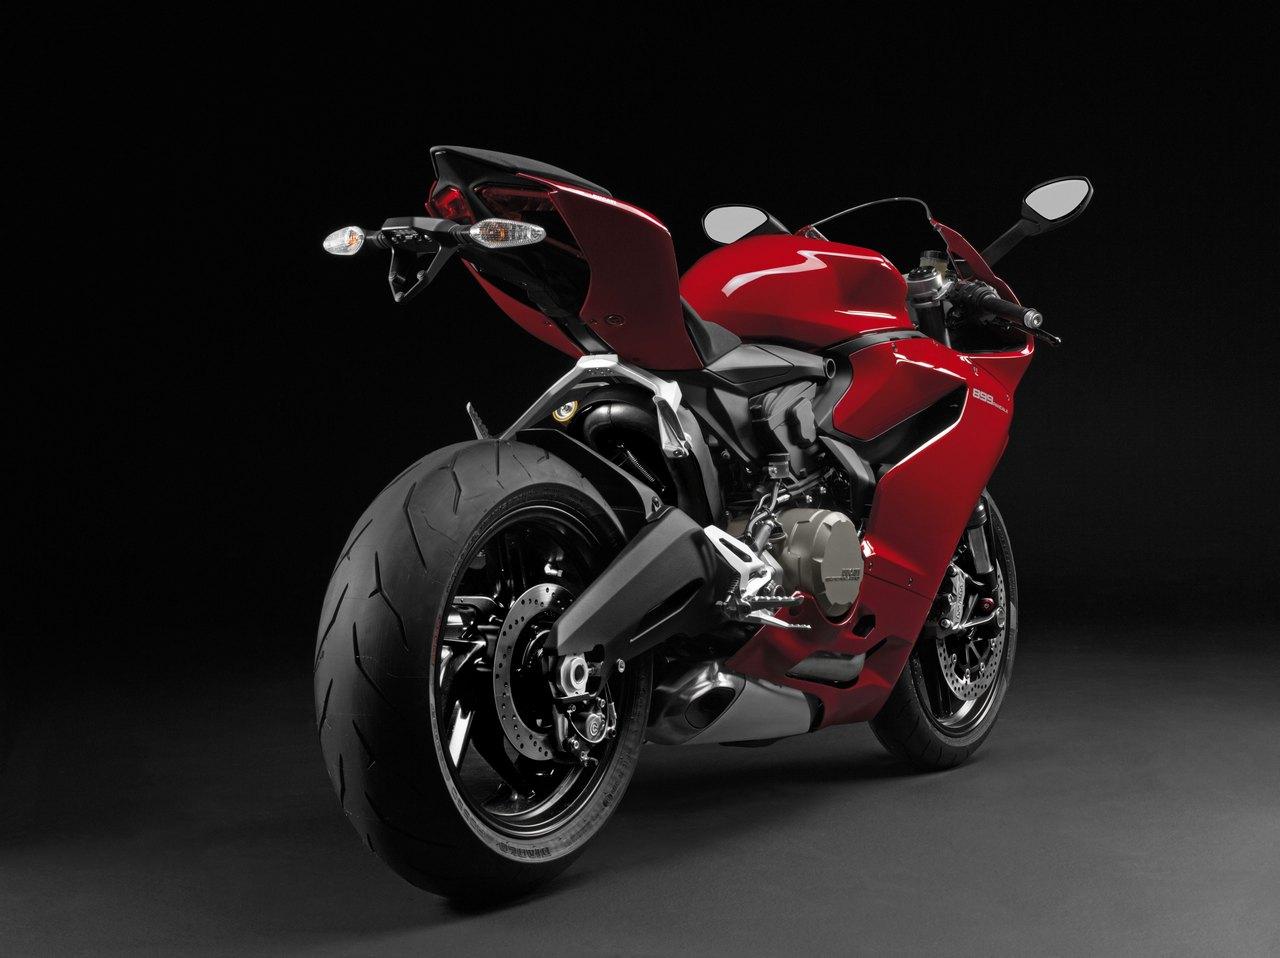 Ducati 899 Panigale - EICMA 2013